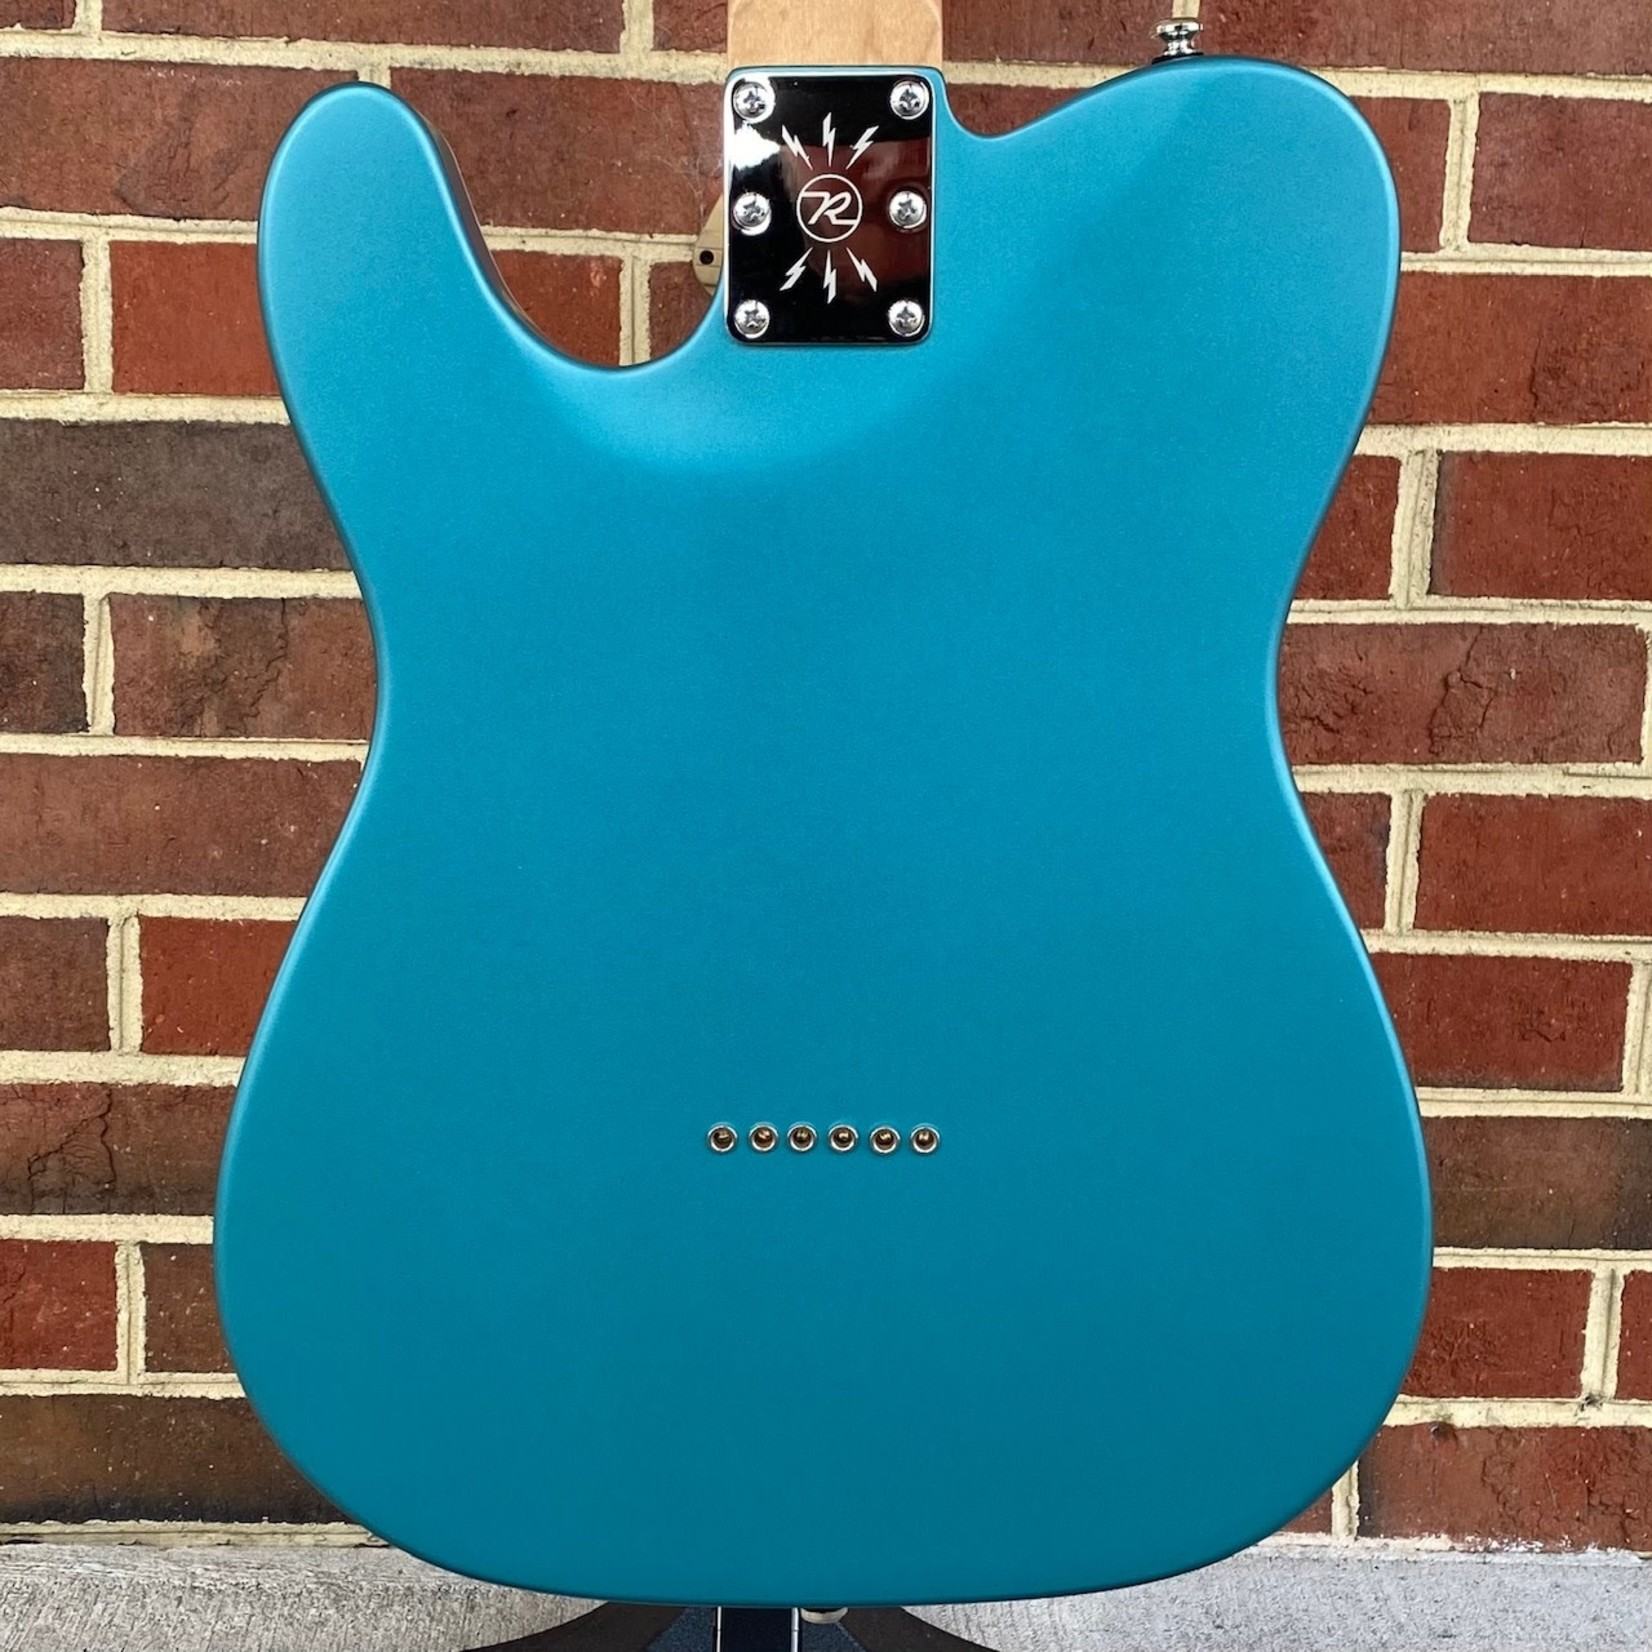 Reverend Reverend Guitars Pete Anderson Eastsider T, Satin Deep Sea Blue, Roasted Maple Neck and Fretboard, SN# 46085